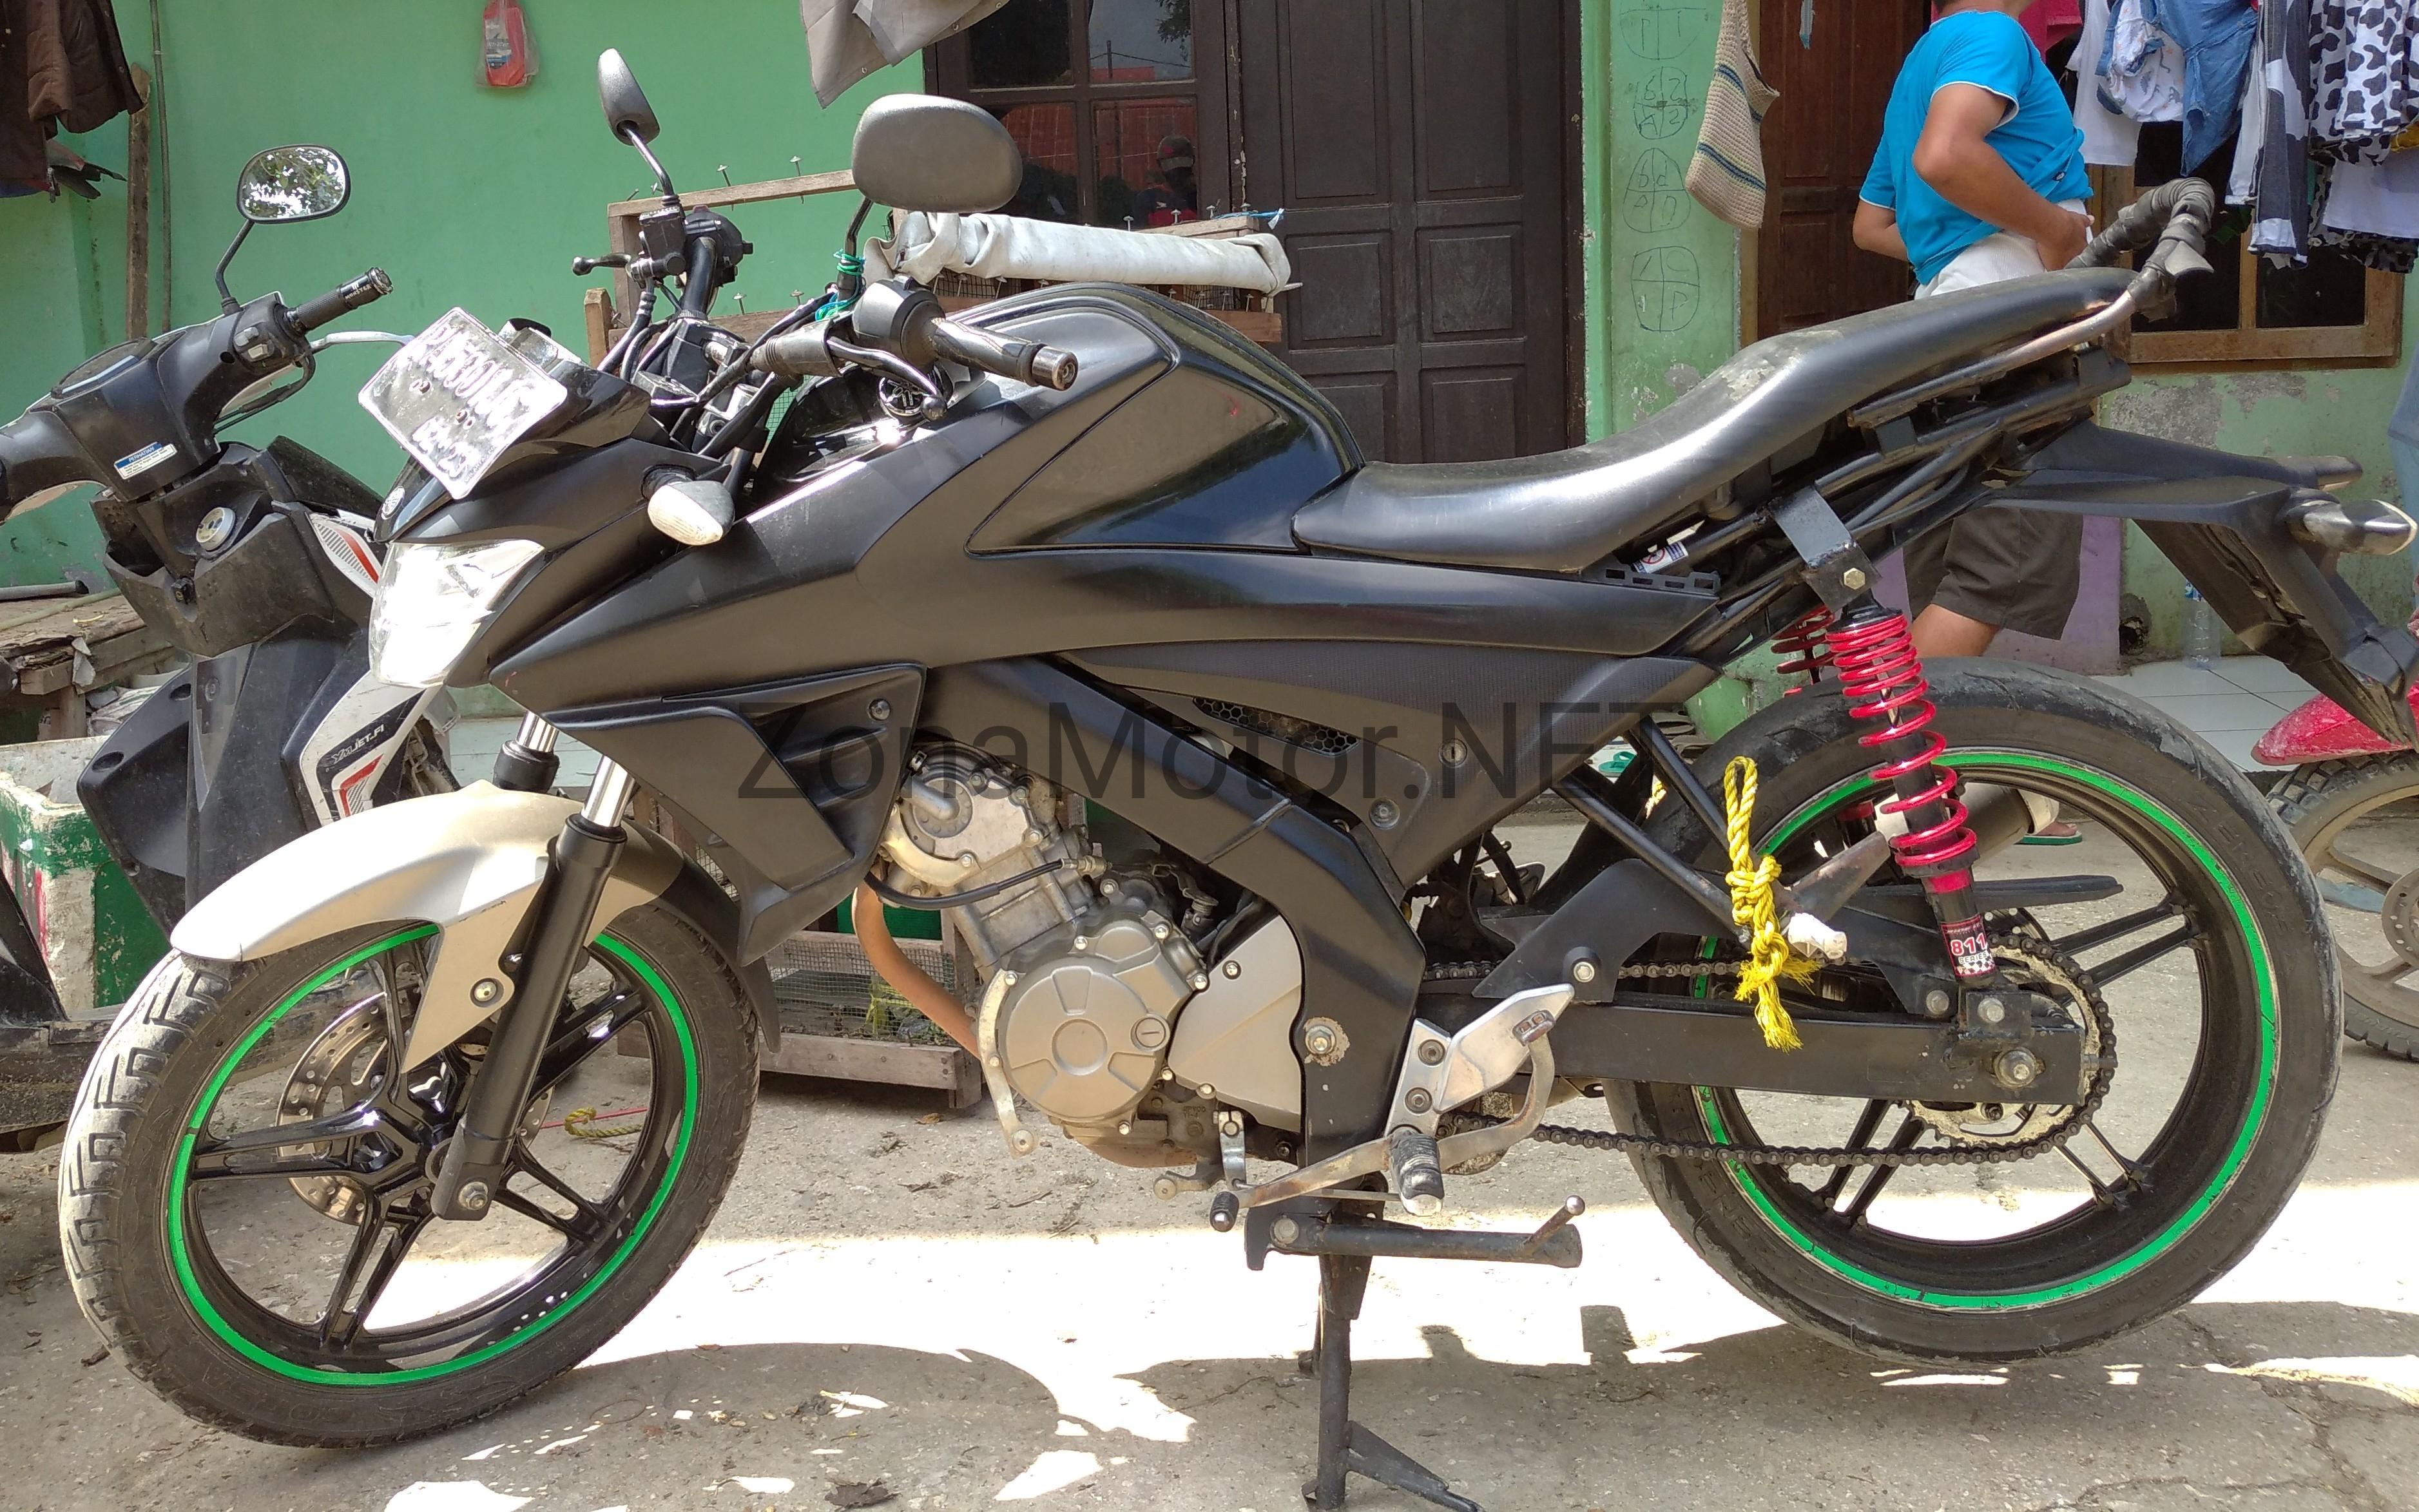 Modifikasi Yamaha All New Vixion Dual Shockbreaker Dan Cerita Kekejaman Kangkung Zona Motor Dot Net